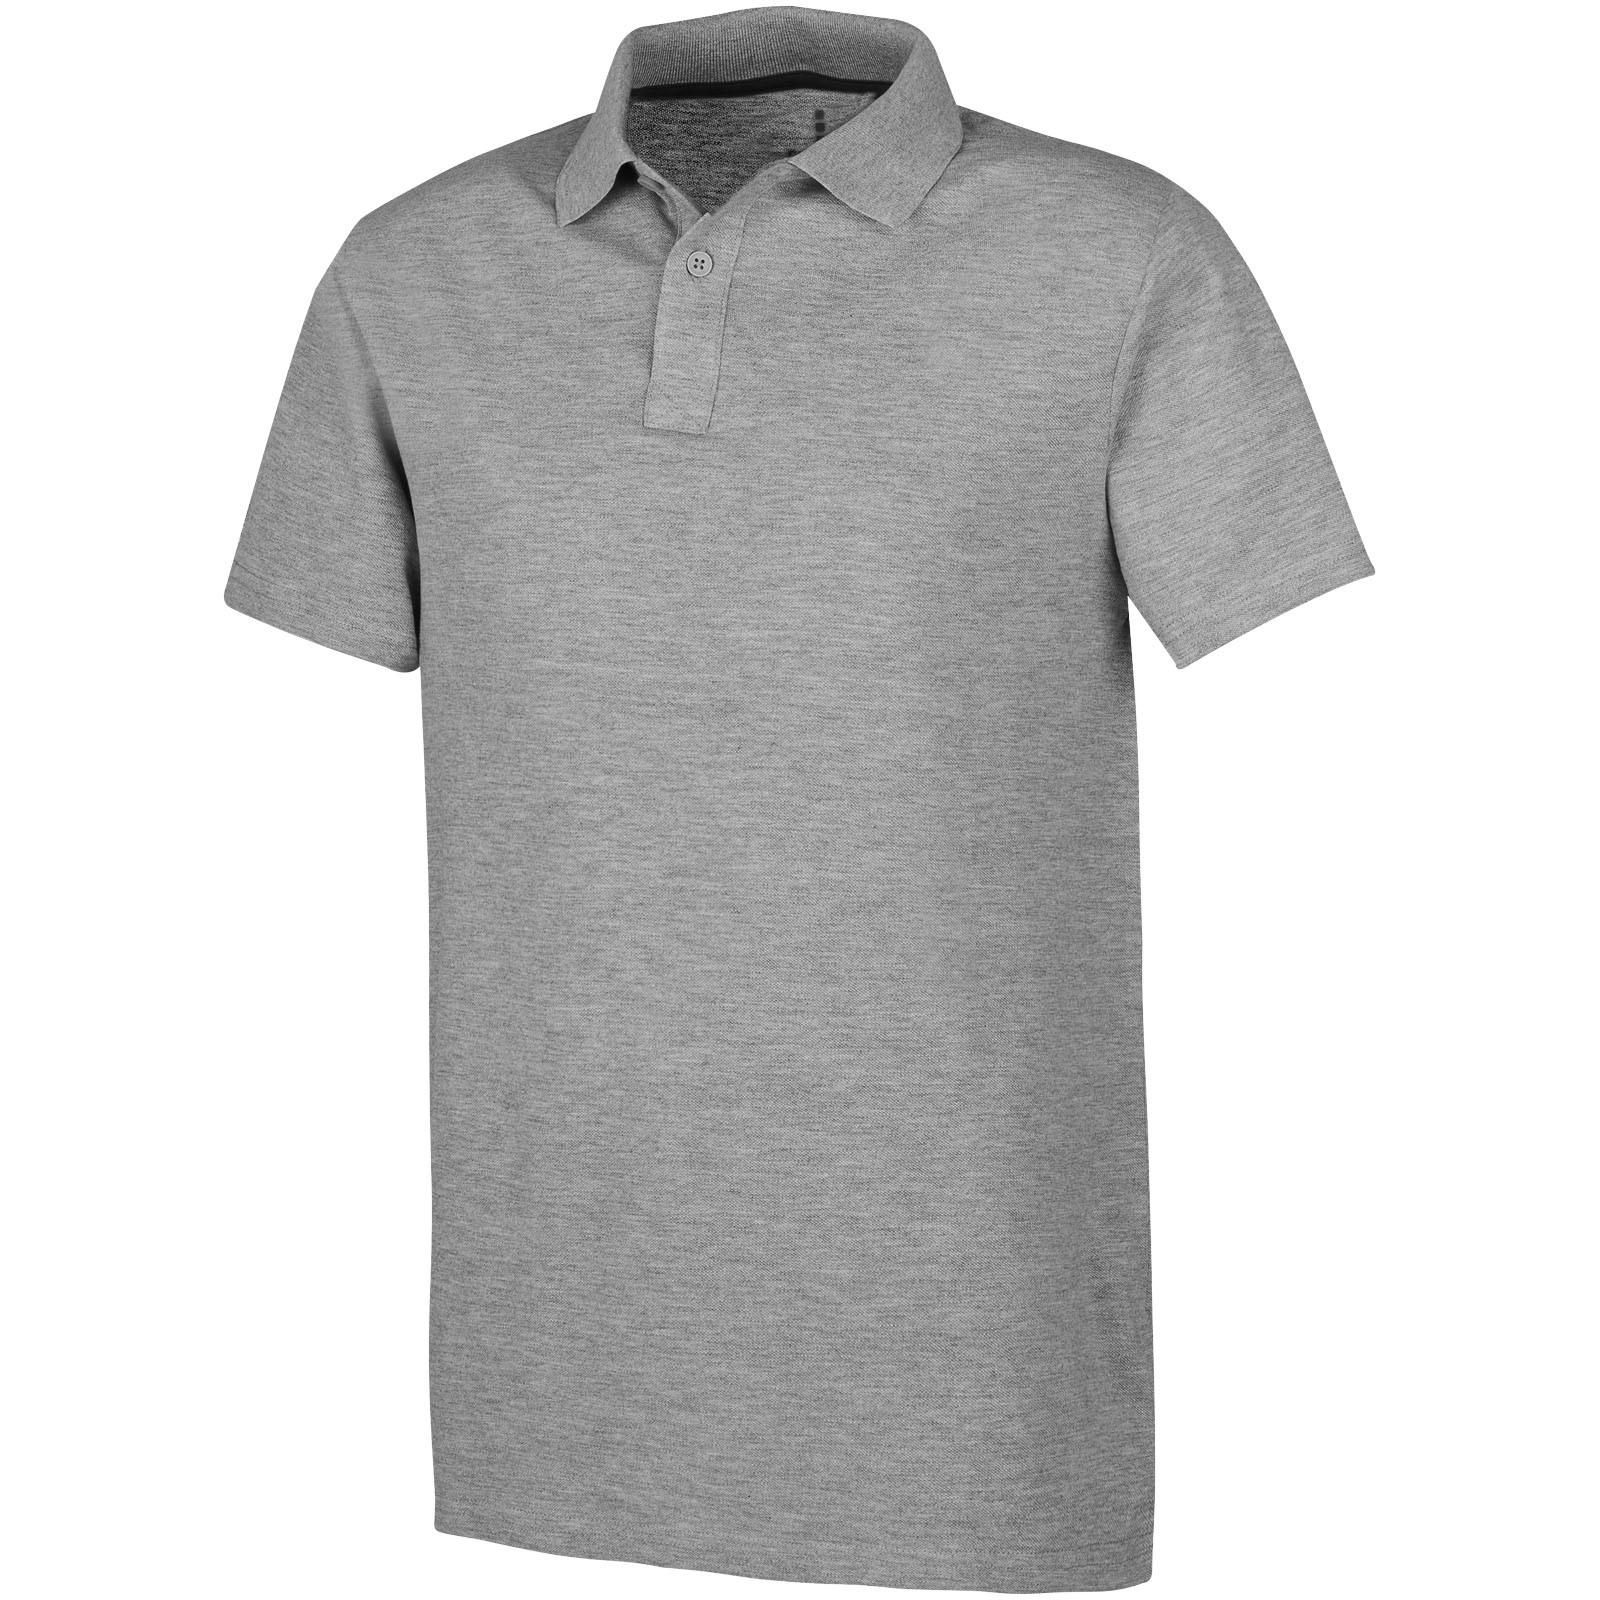 Primus short sleeve men's polo - Grey melange / XS